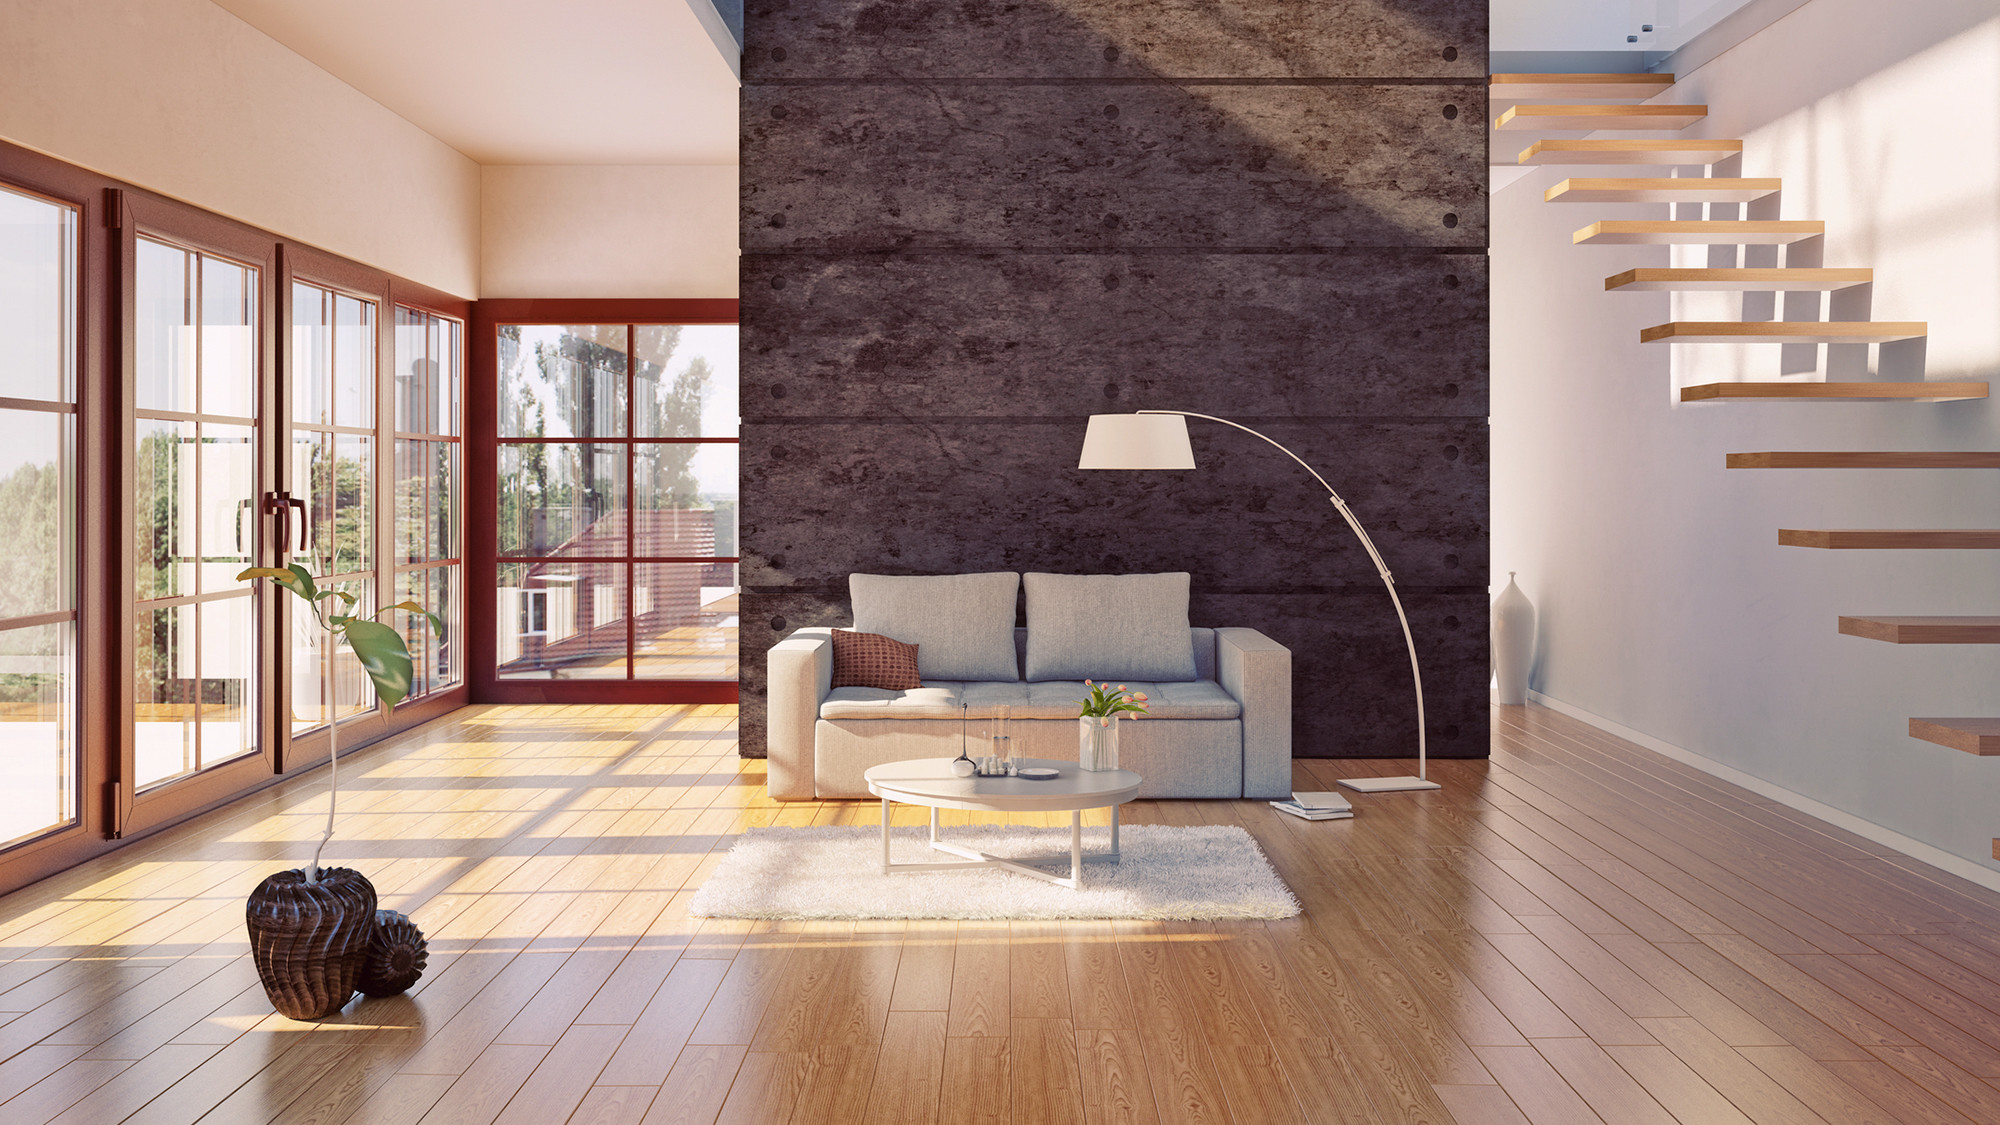 hardwood floor repair products of do hardwood floors provide the best return on investment realtor coma pertaining to hardwood floors investment